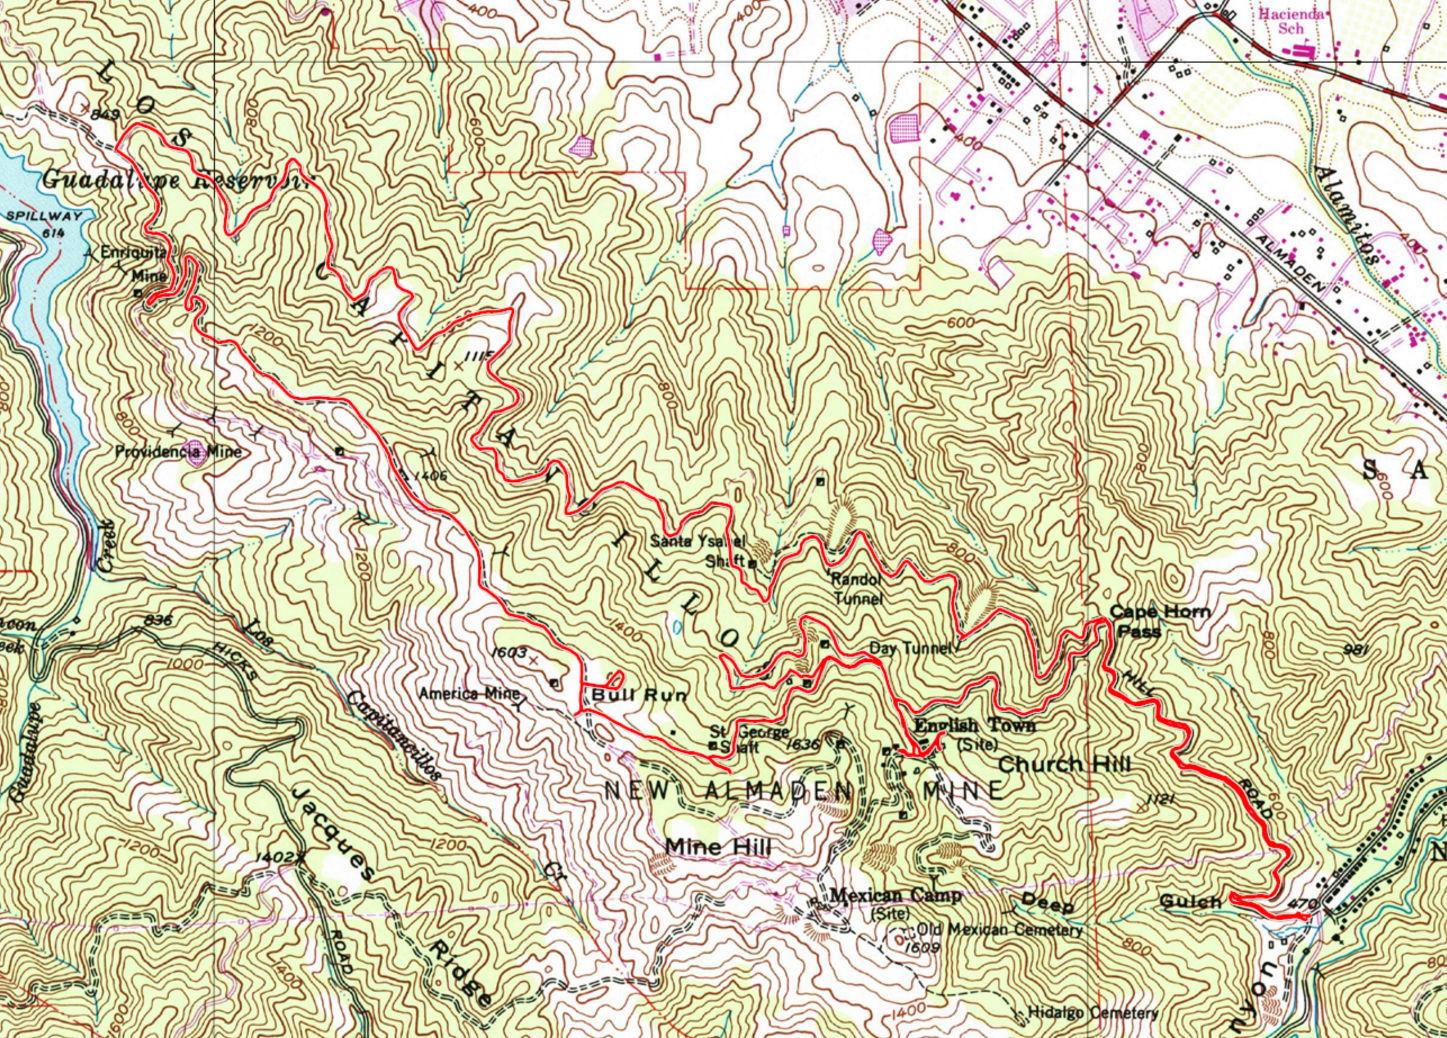 San Jose Calif Map%0A     ideas Quiksilver San Jose Map on christmashappynewyearsdownload   Almaden Quicksilver Park Bay Area Mountain Bike Rides